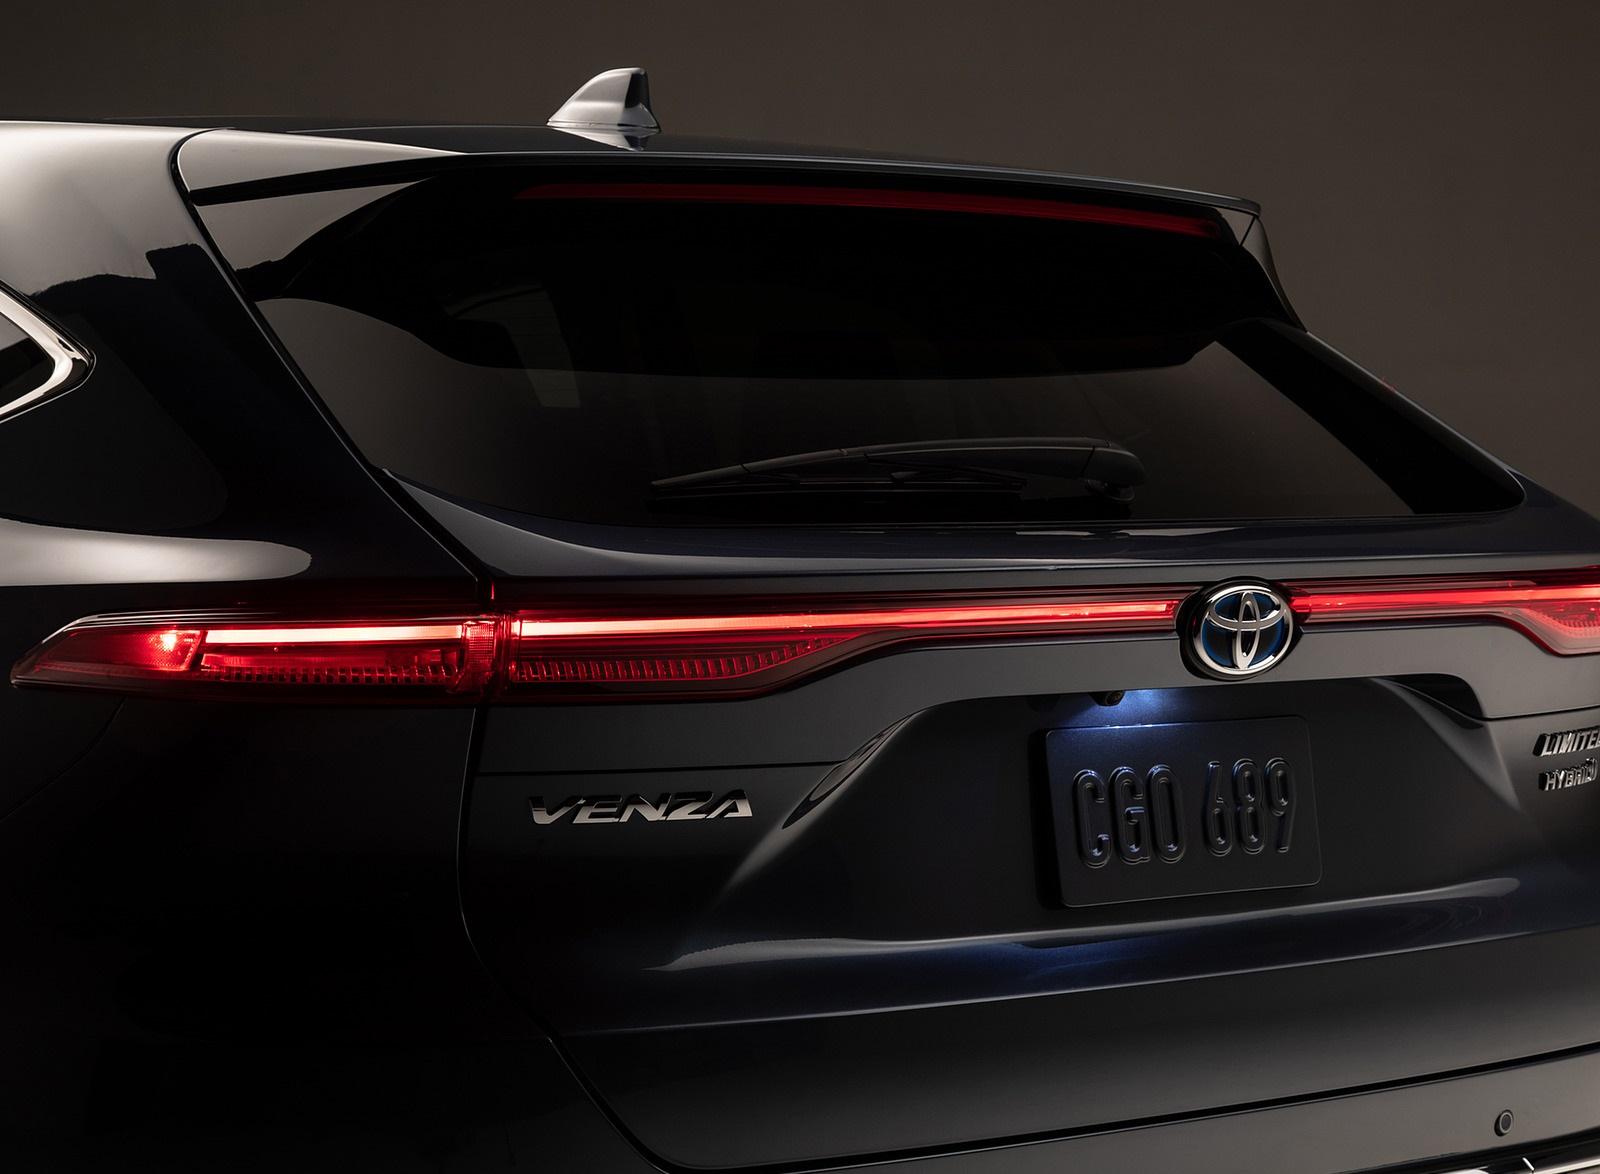 2021 Toyota Venza Exhaust Wallpapers (10)